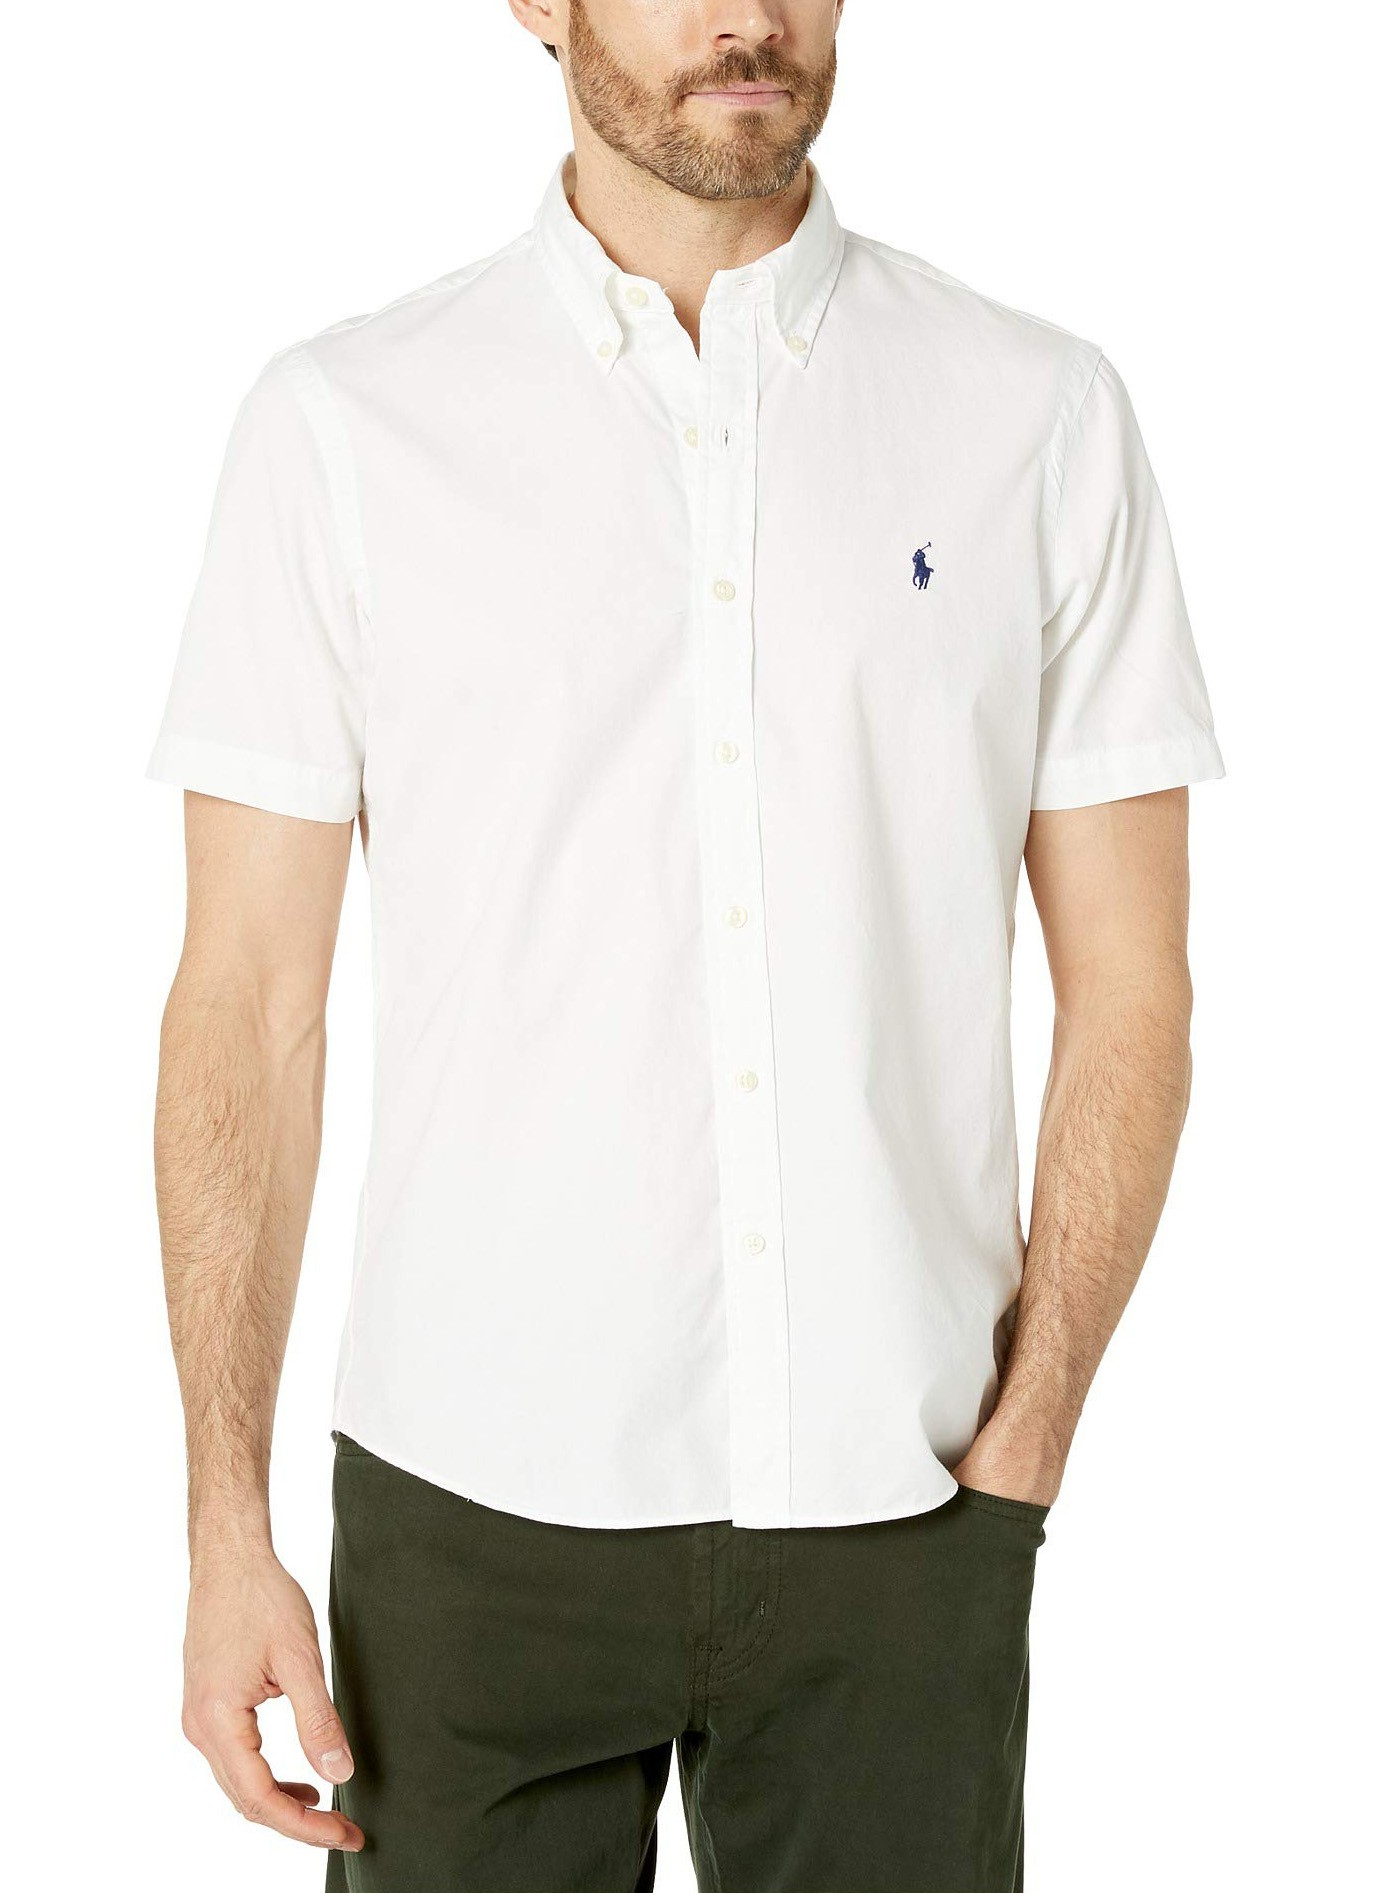 Camisa Ralph Lauren Masculina Manga Curta Custom Fit Algodão Branco